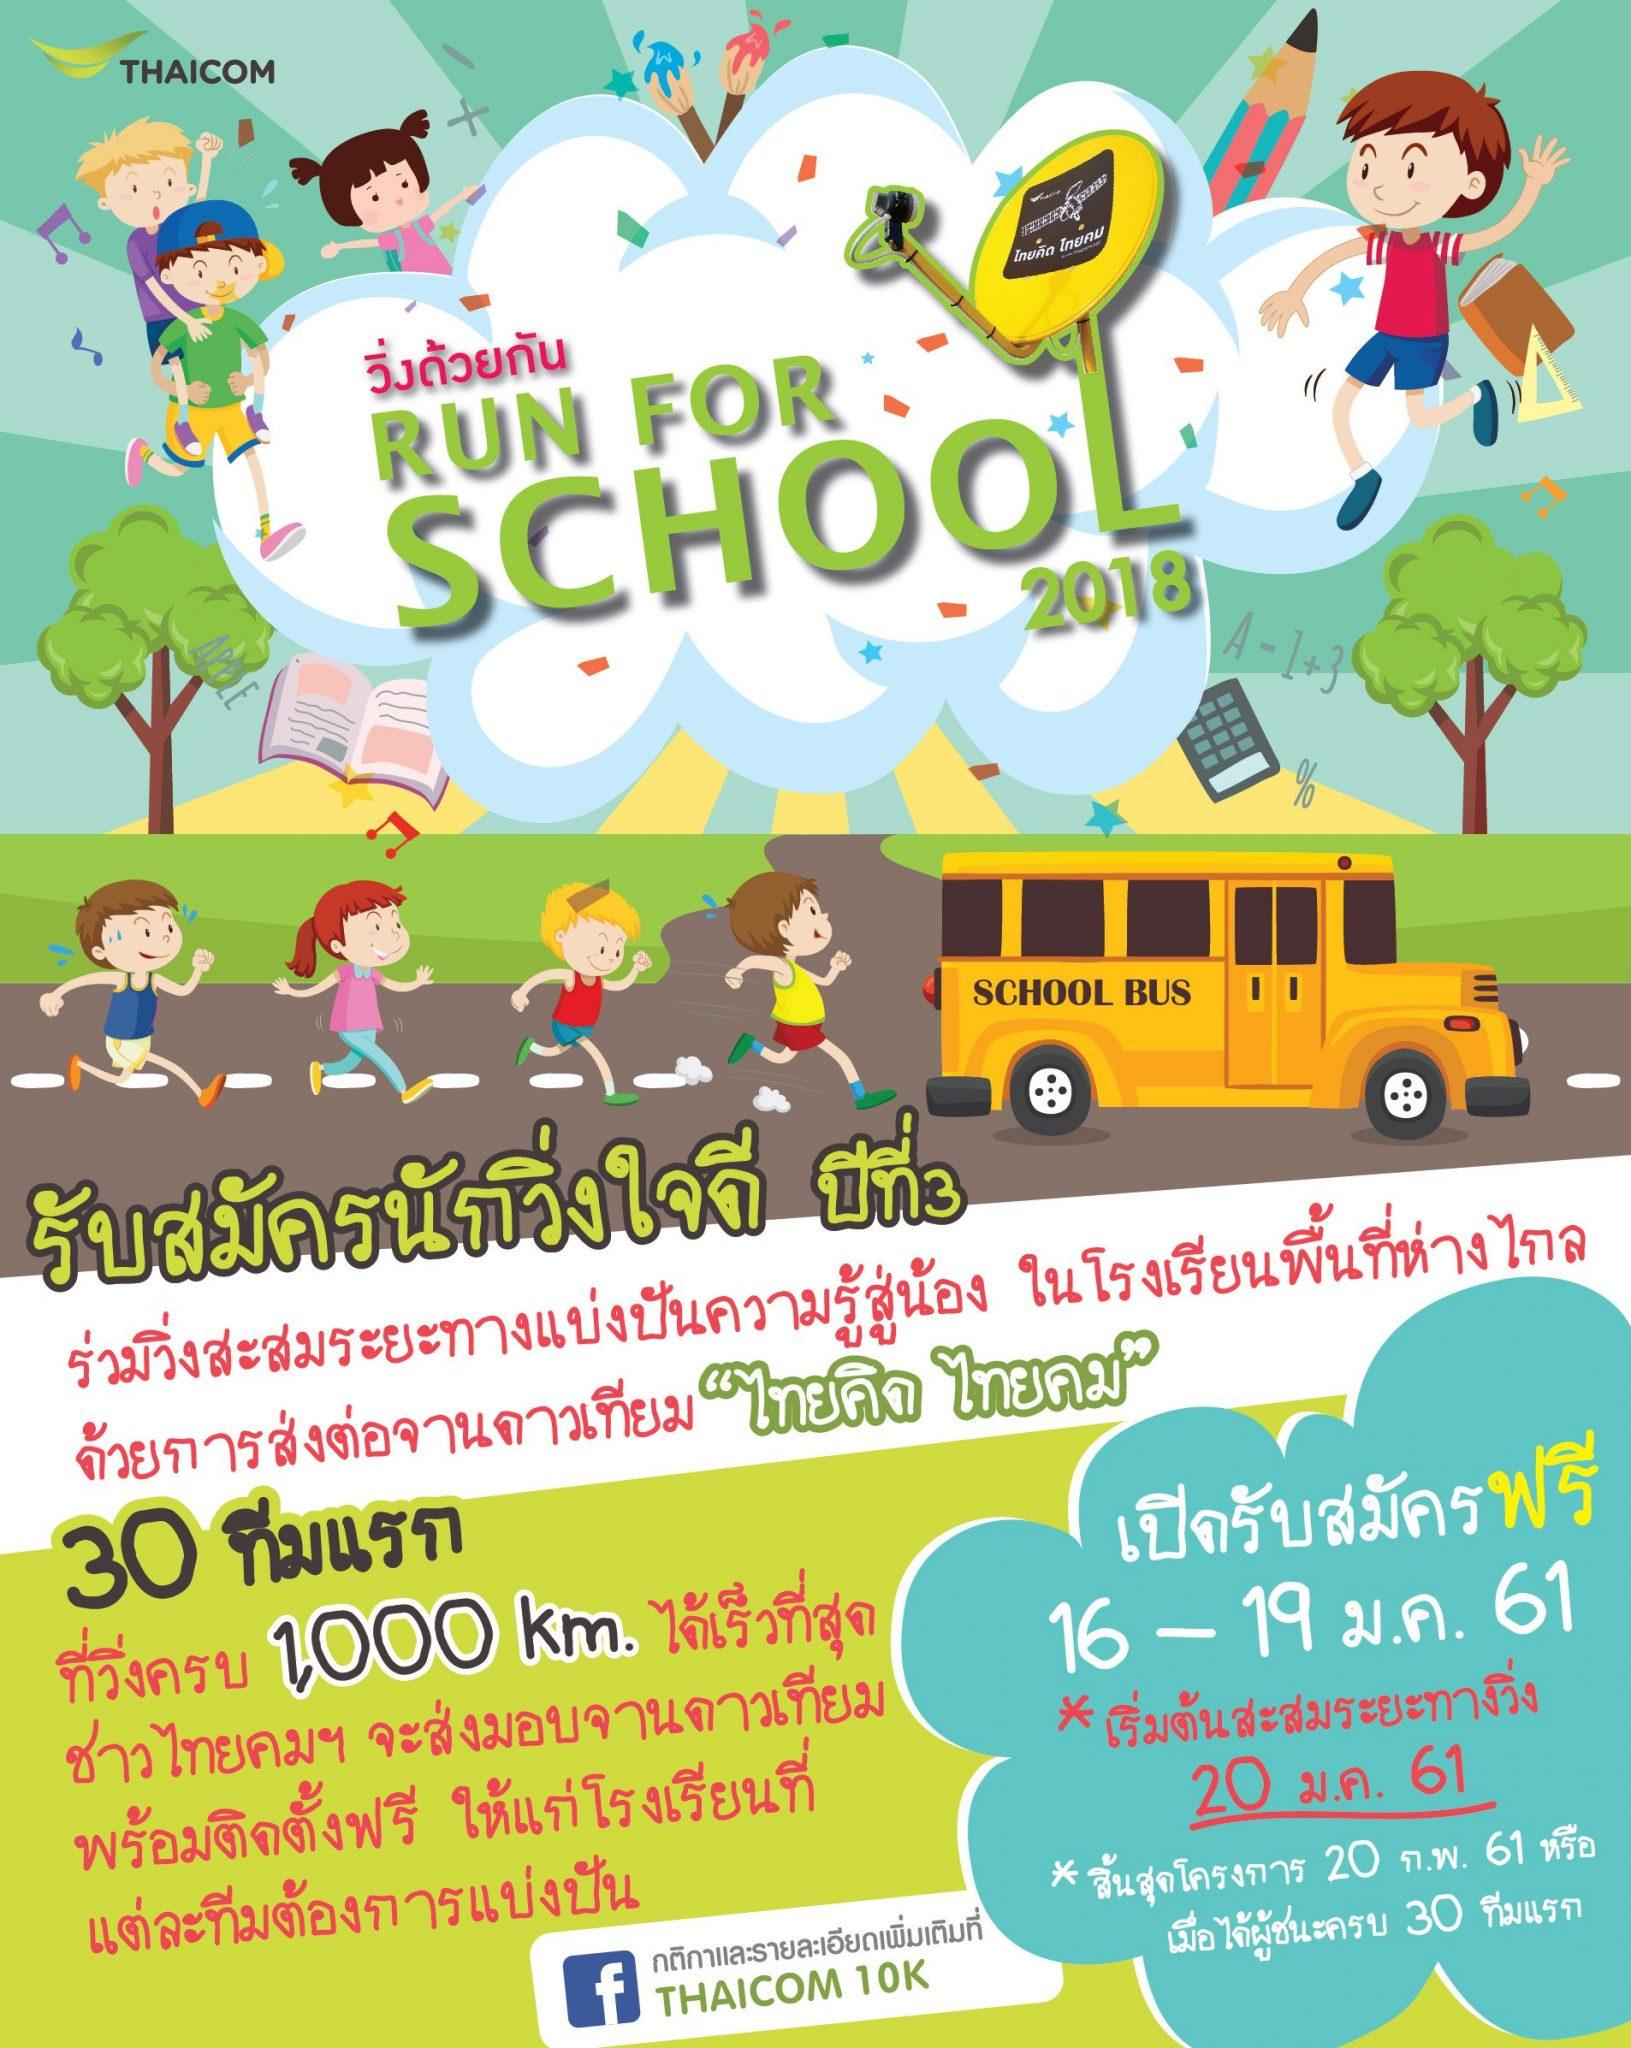 THAICOM RUN for SCHOOL 2018 : ช่วยกันวิ่งมอบความรู้สู่น้อง 13 -